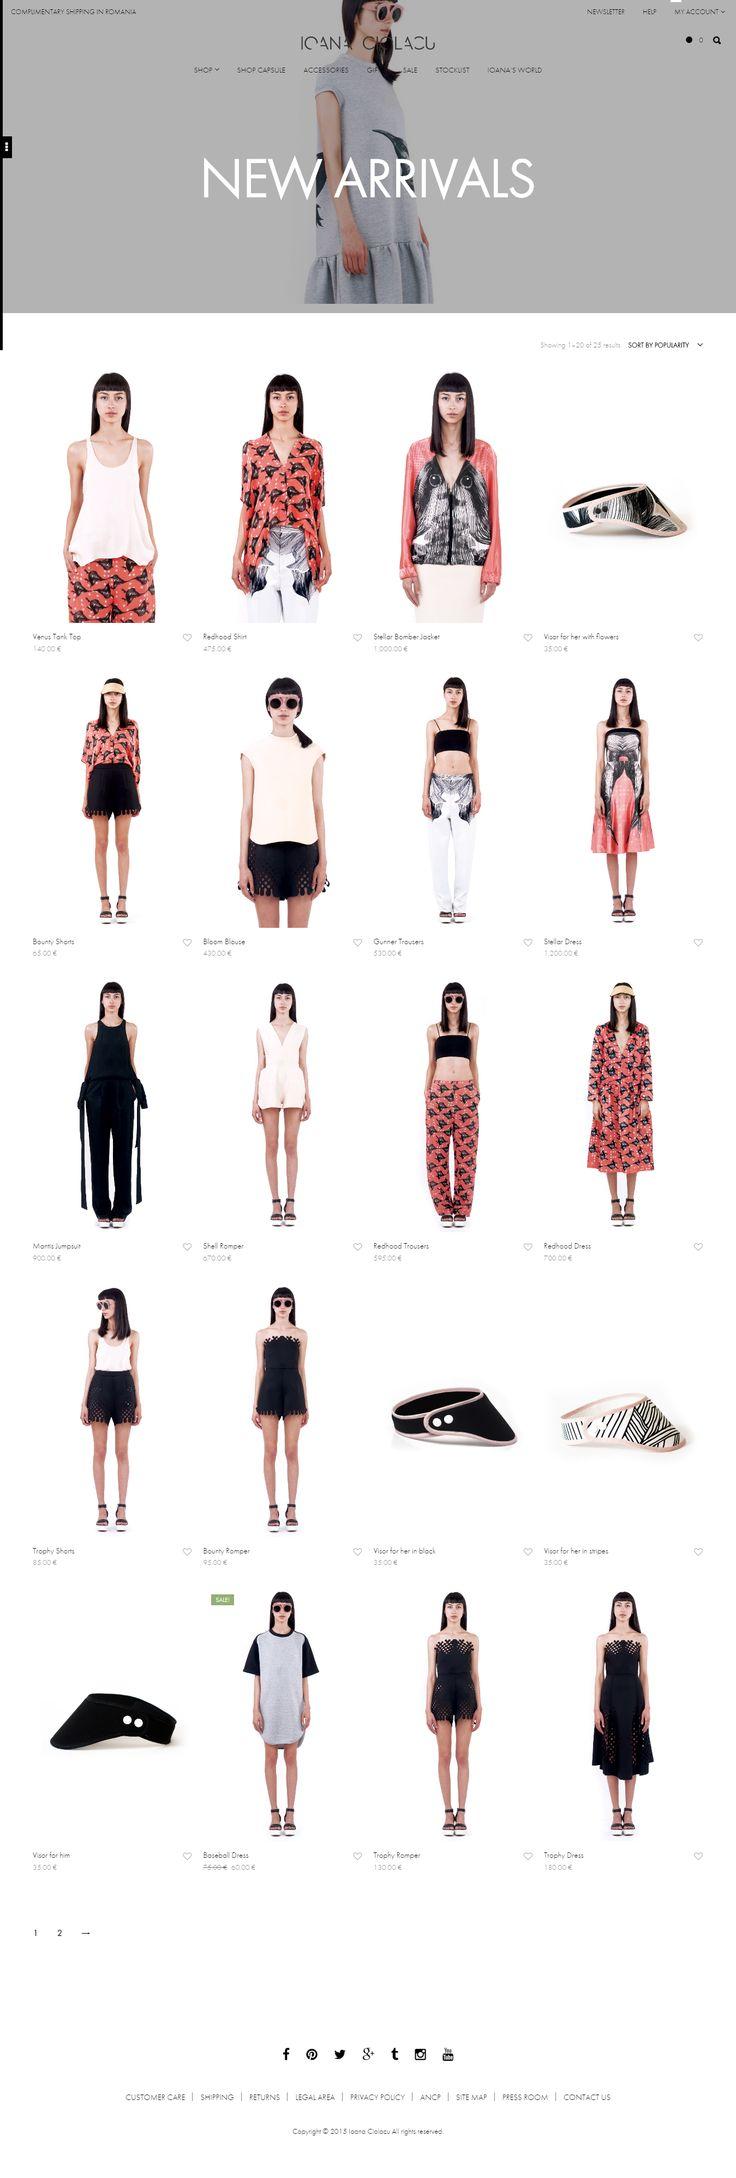 Meet Ioana of the fashion brand Ioana Ciolacu. She has built an amazing online shop using Shopkeeper #WordPress #theme http://www.getbowtied.com/customer-stories-meet-ioana-of-the-fashion-brand-ioana-ciolacu-shop/?utm_source=pinterest.com&utm_medium=social&utm_content=ioana-ciolacu&utm_campaign=customer-stories